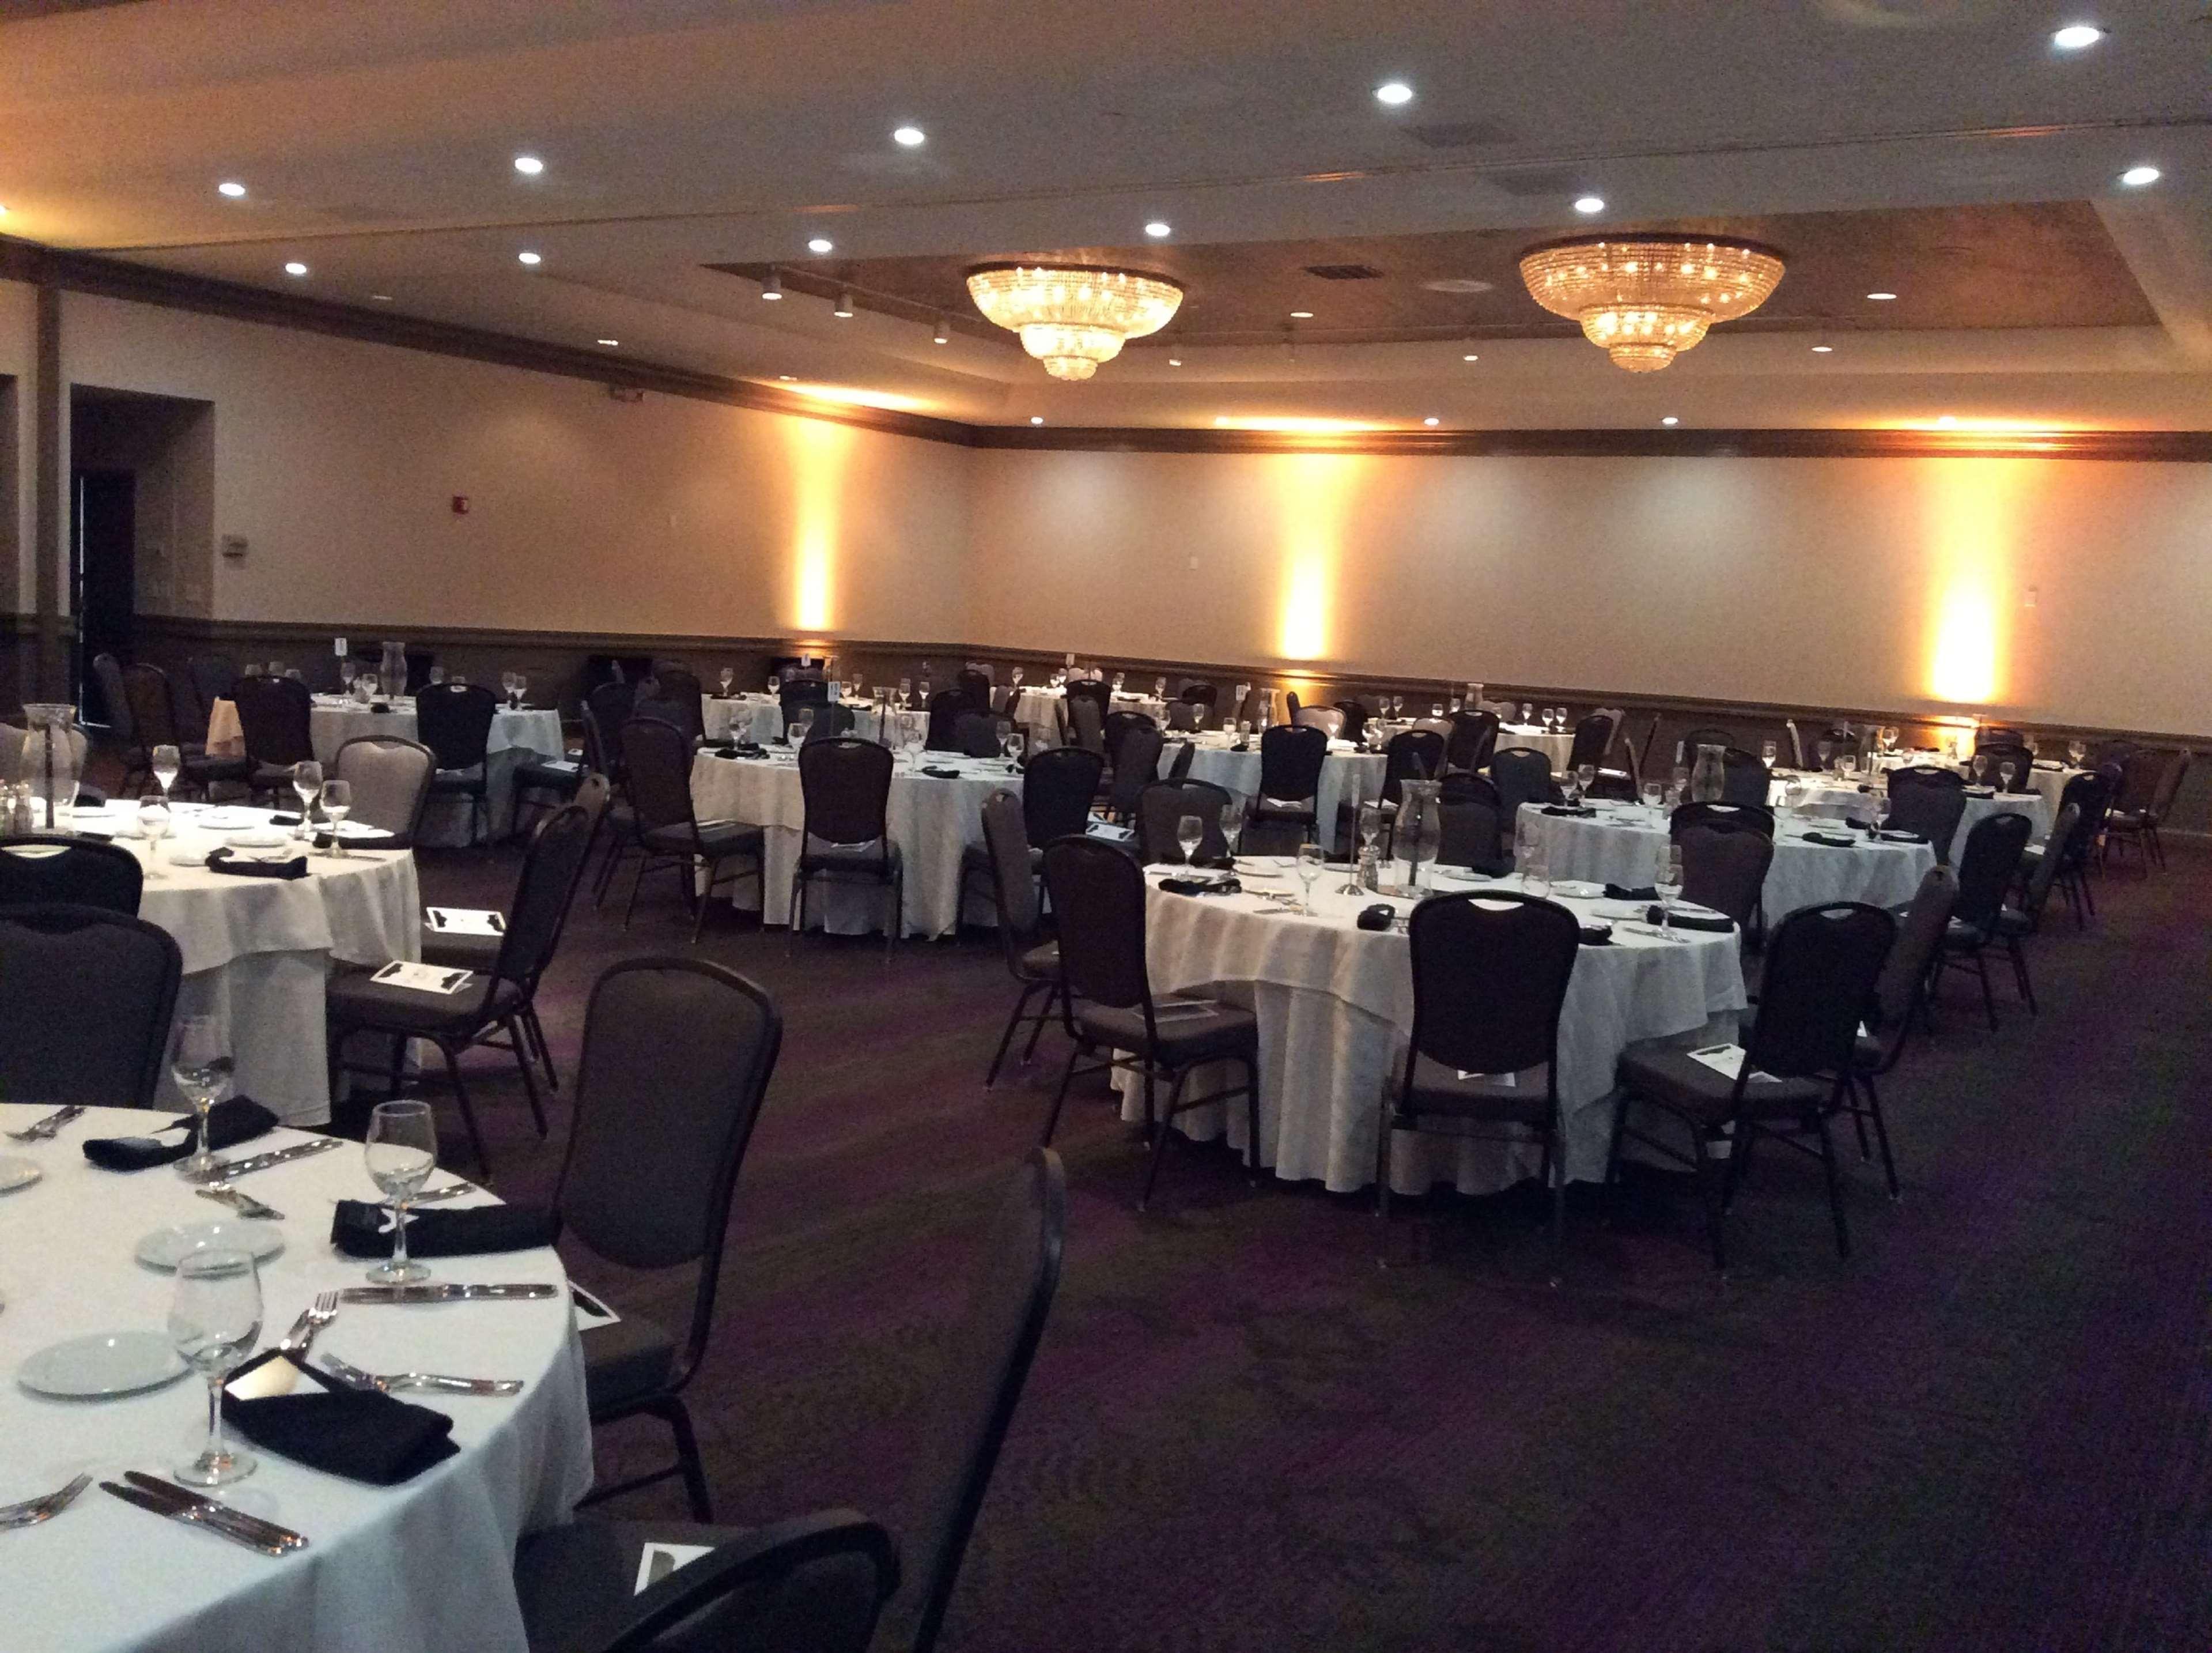 Hilton Washington DC/Rockville Hotel & Executive Meeting Ctr image 49